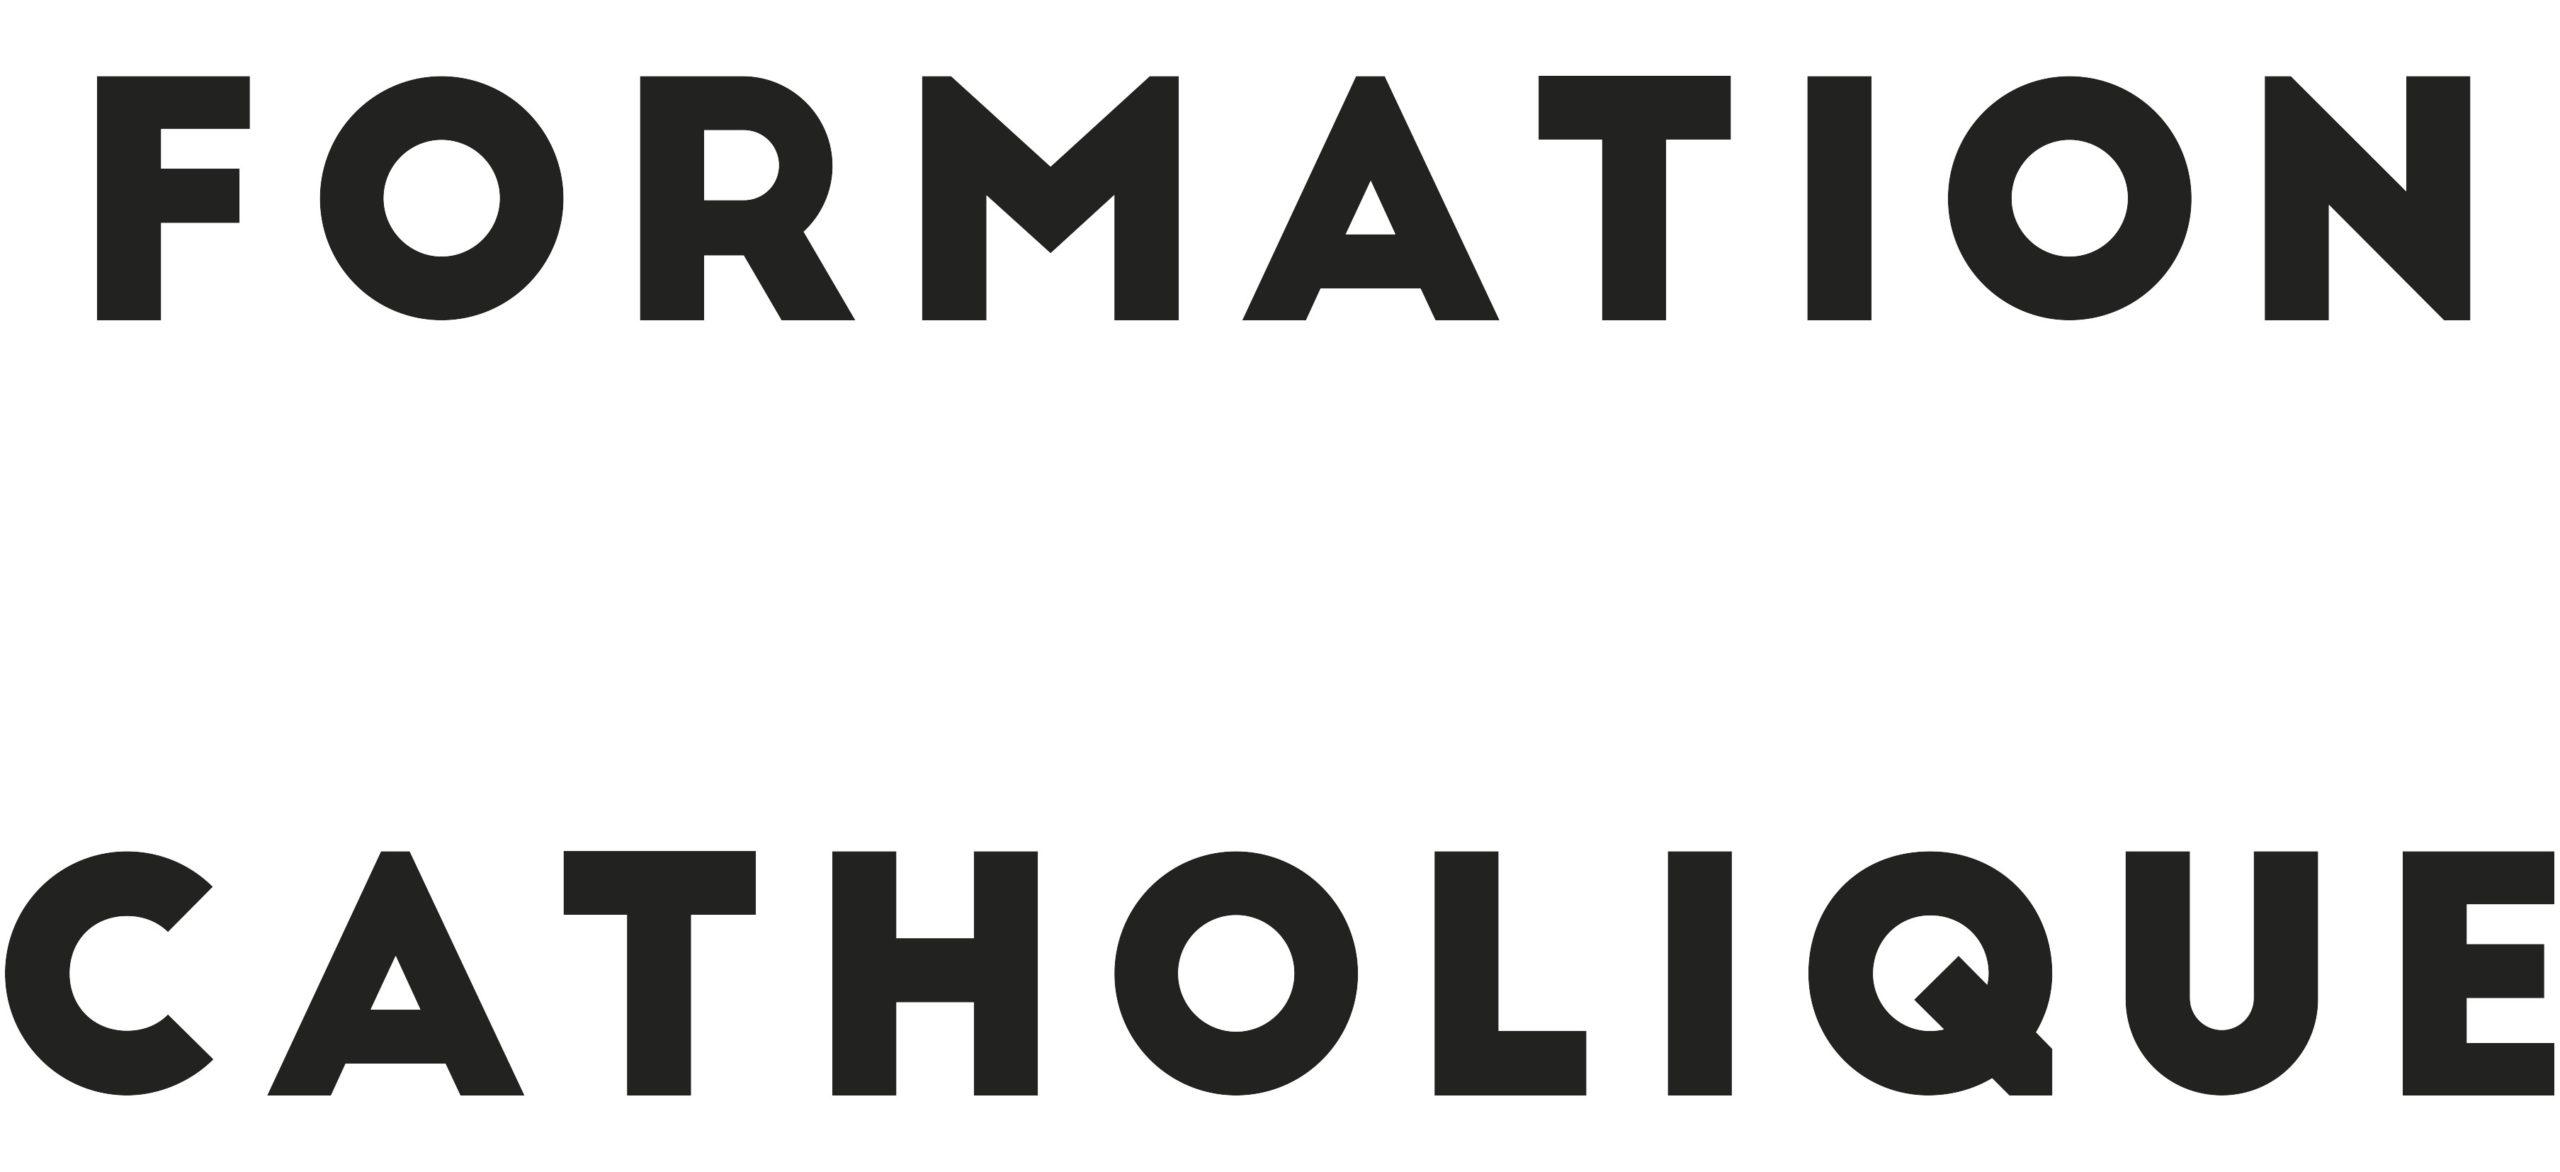 FORMATION CATHOLIQUE